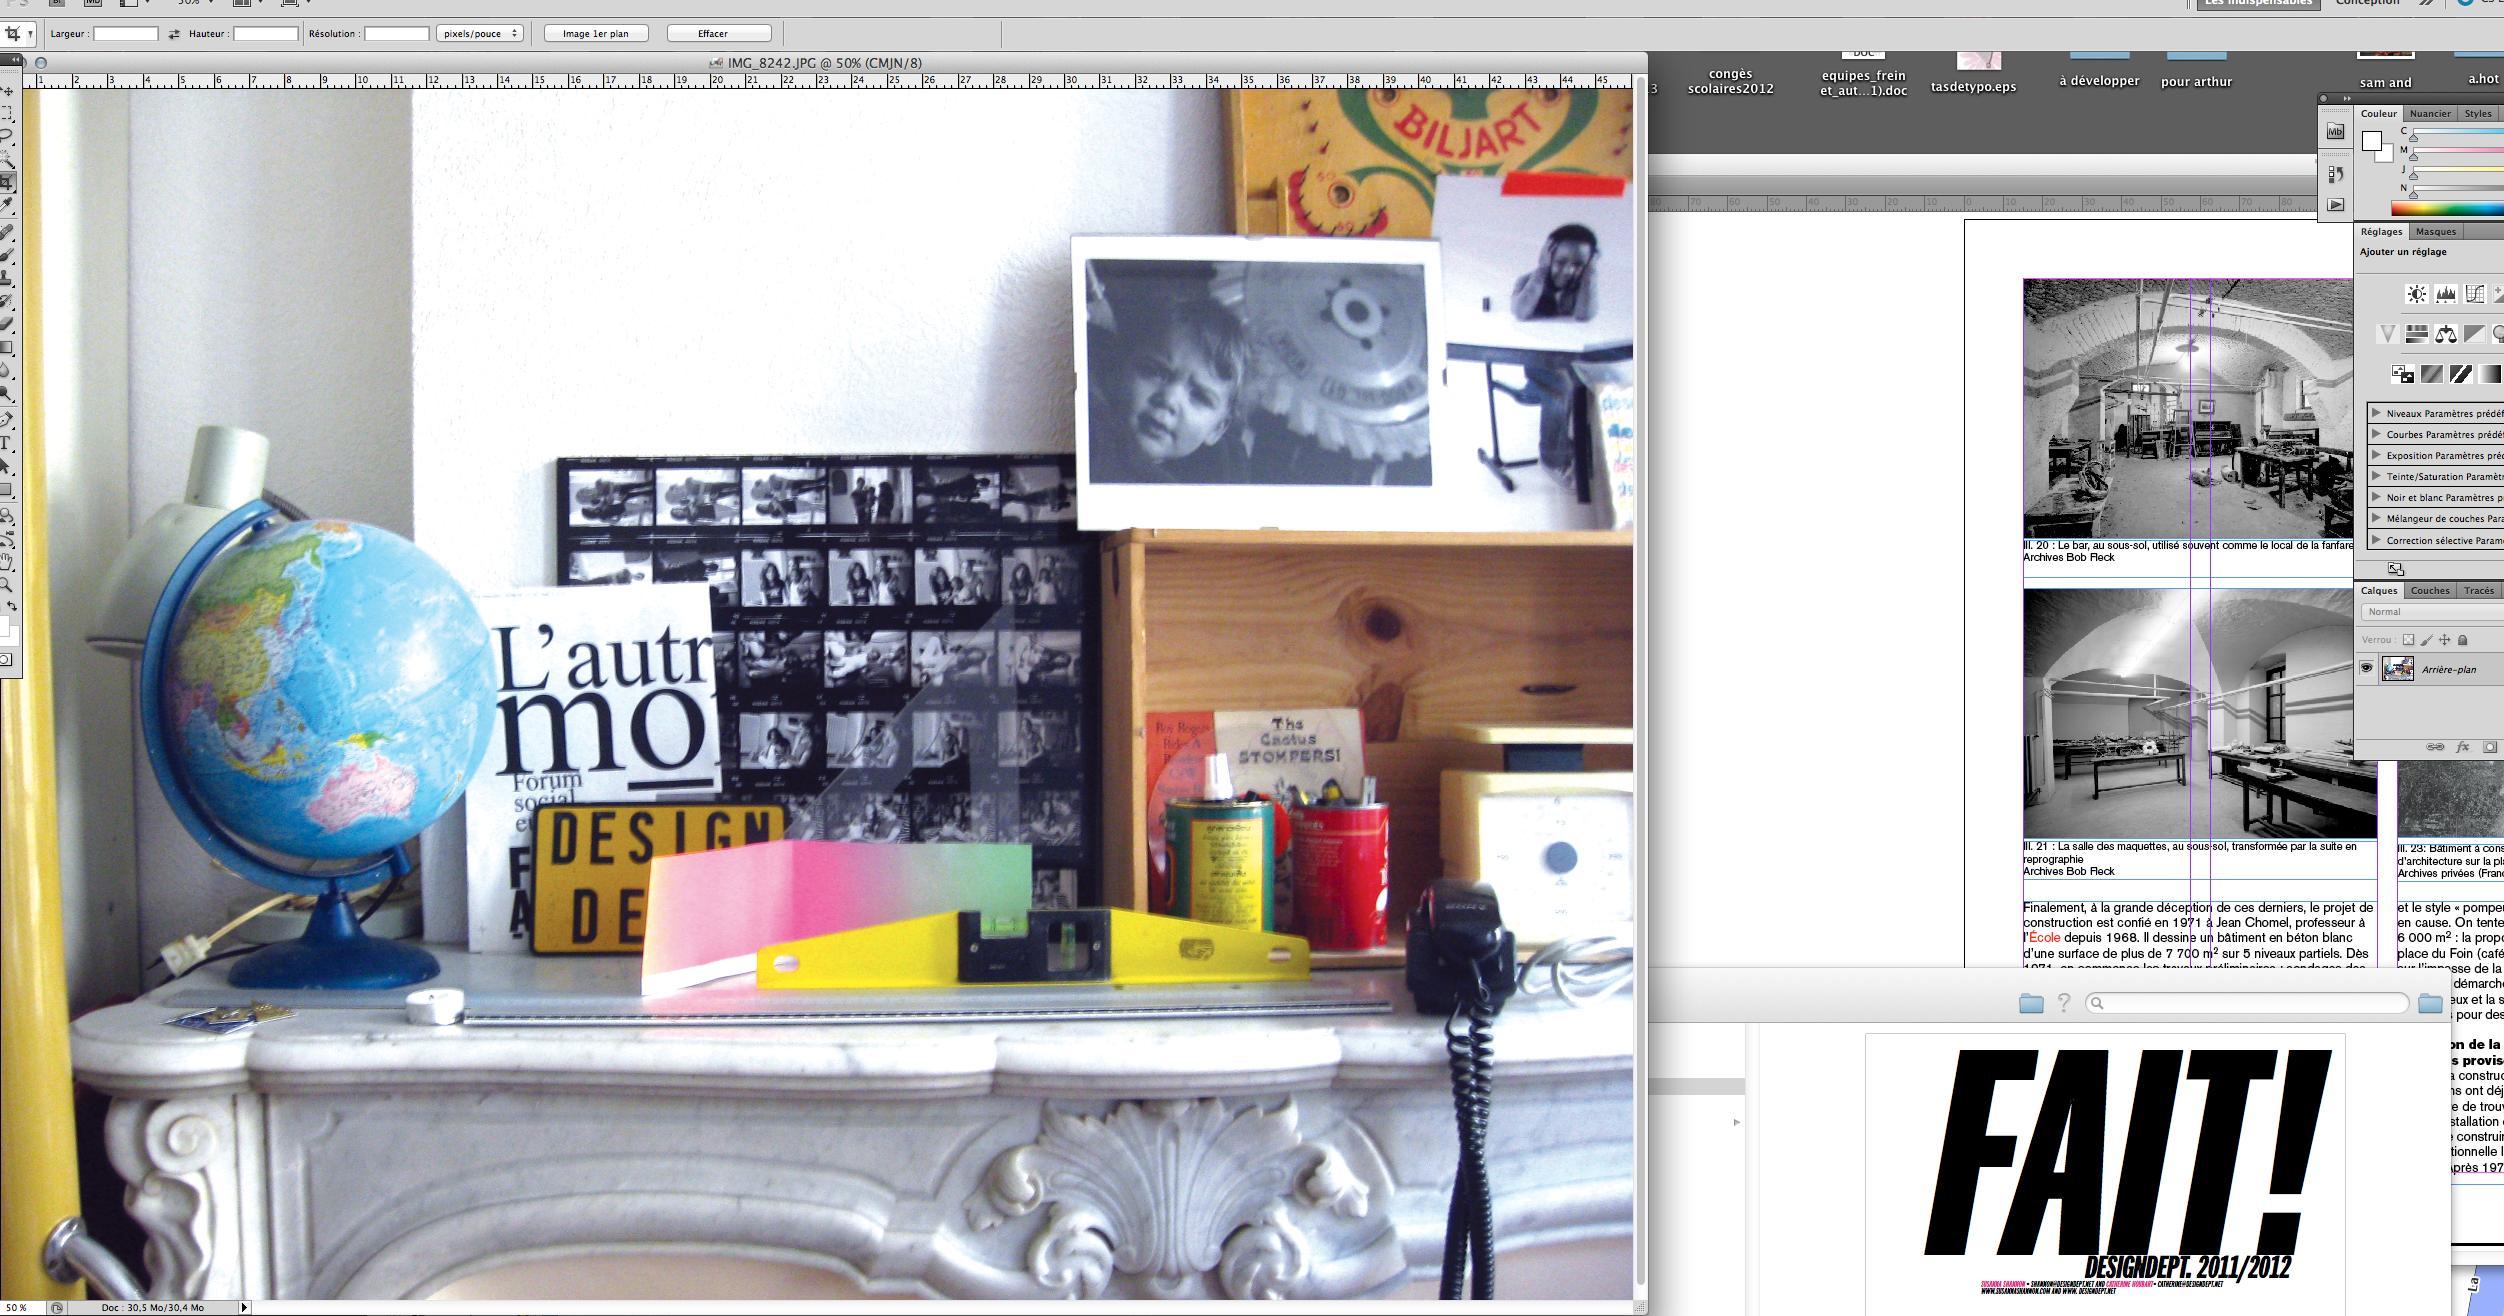 2013 design dept. vue du bureau